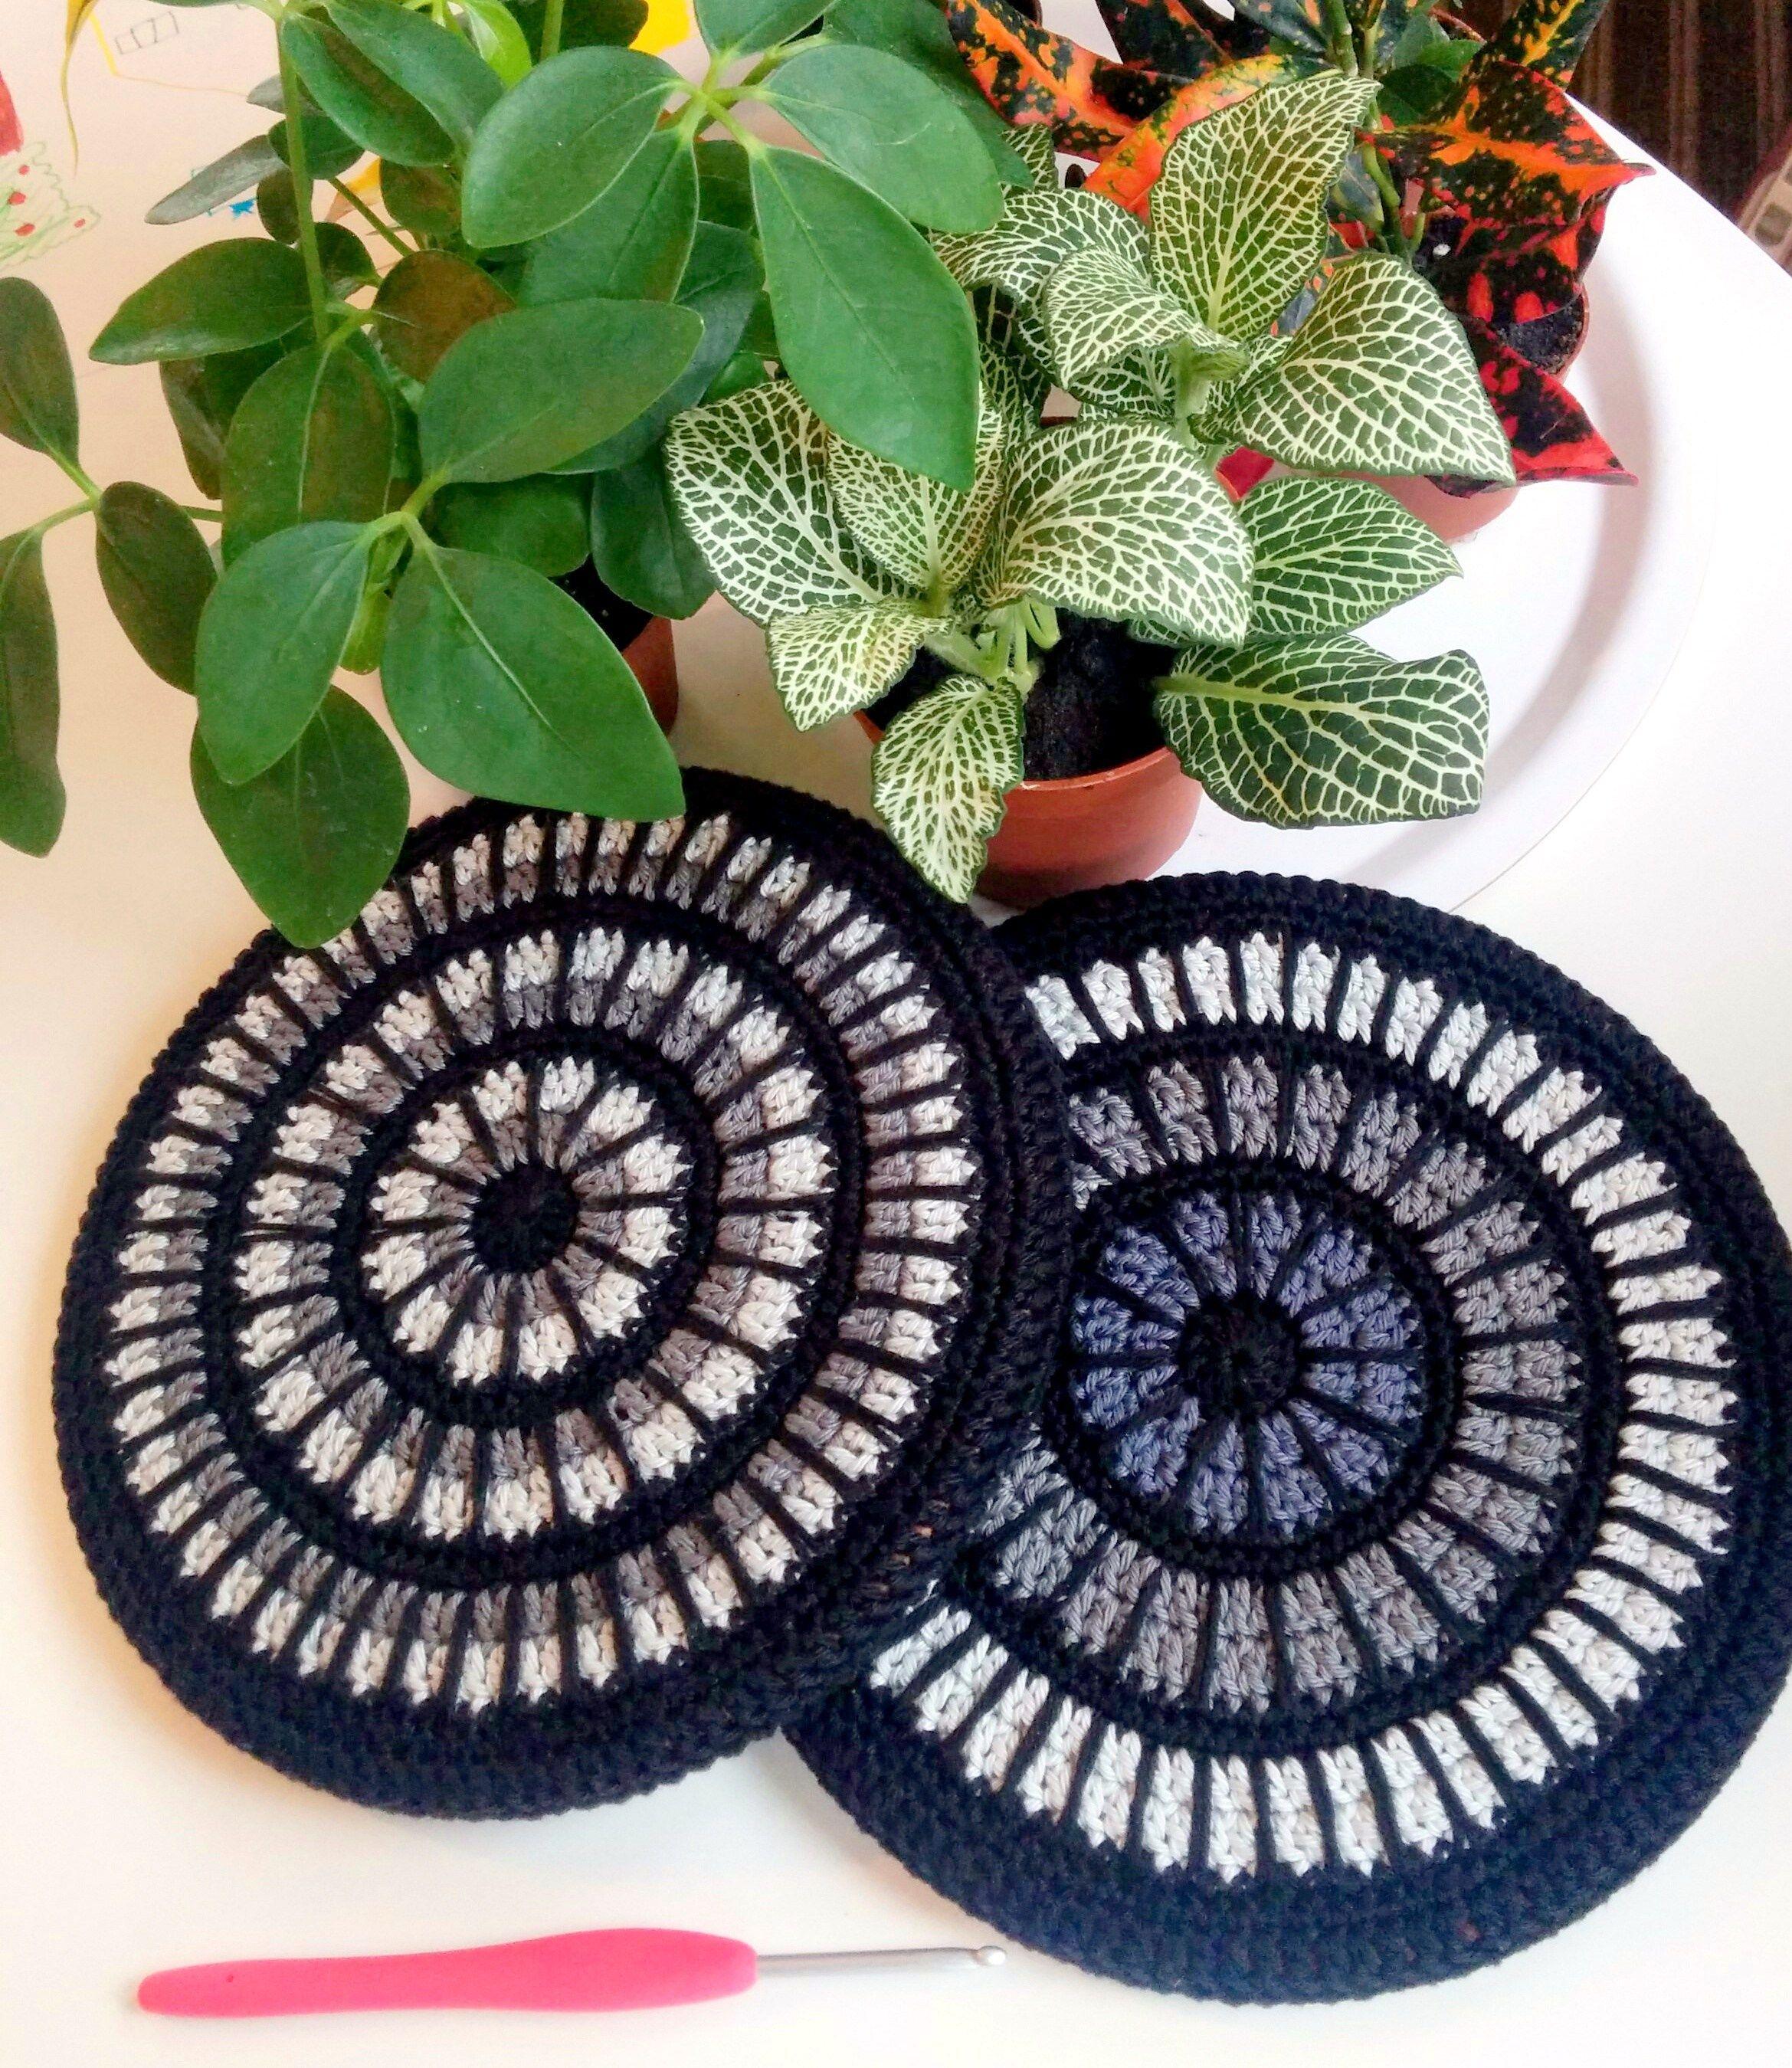 Crochet covers for IKEA cork trivets. Brilliant! | Crochet Mandalas ...